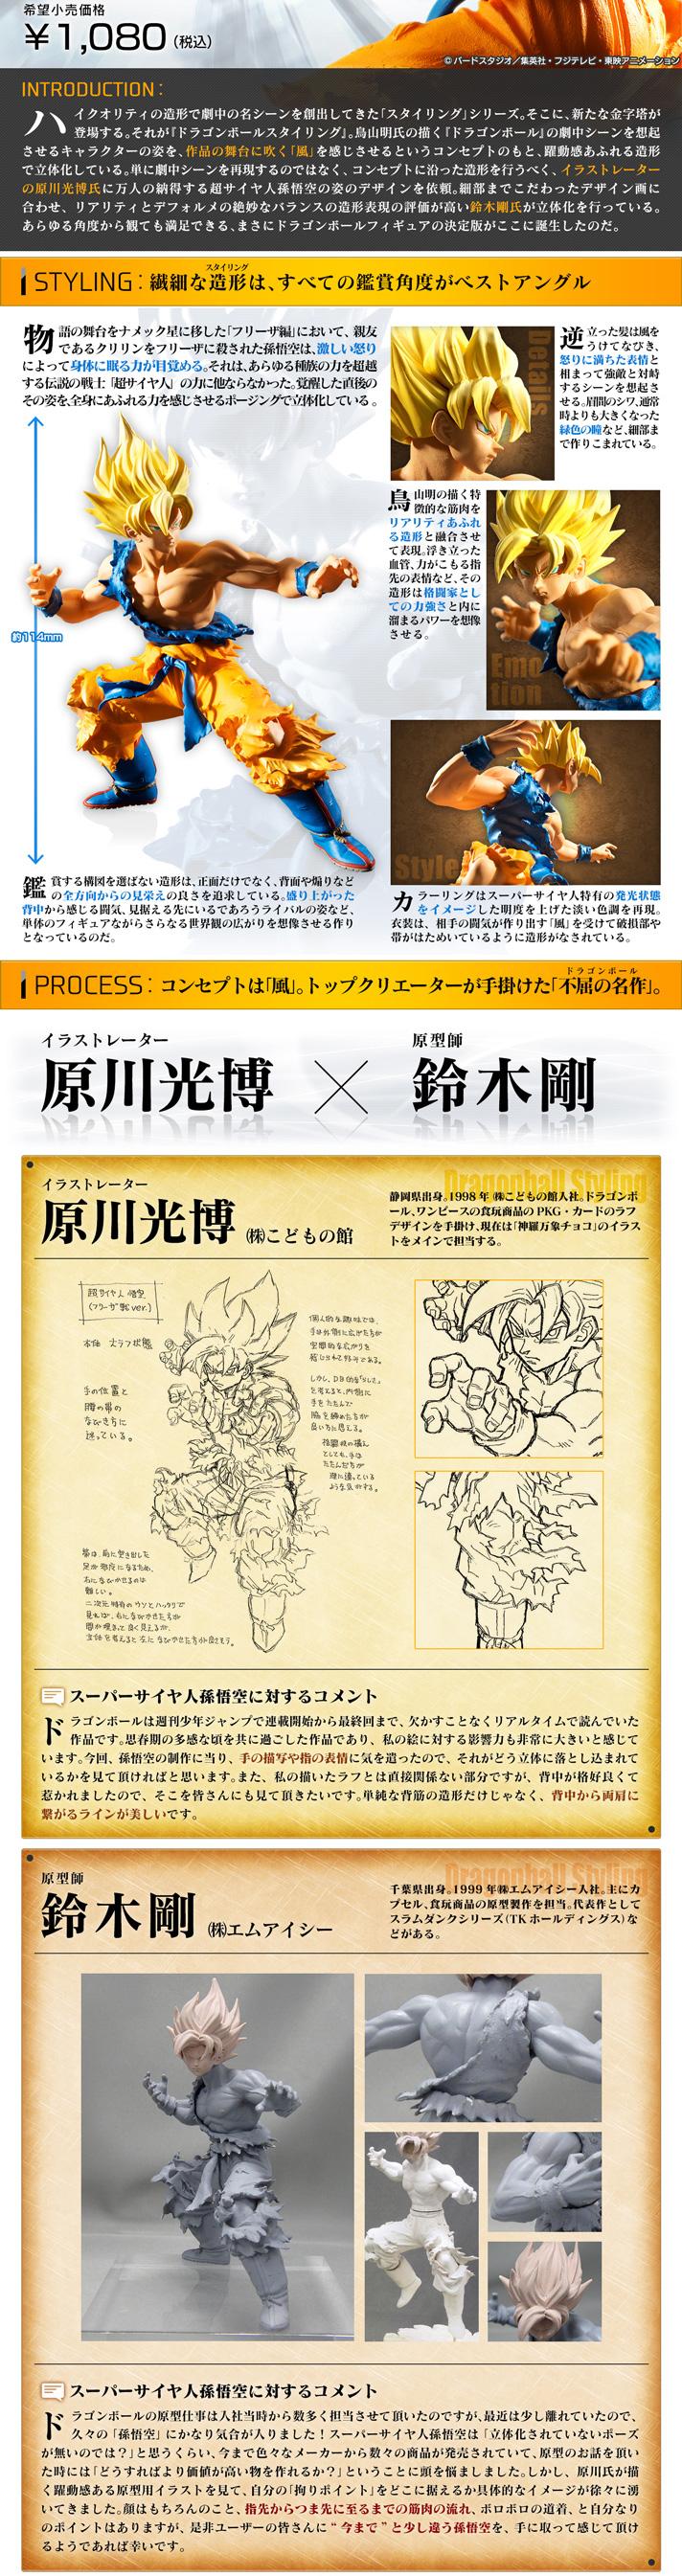 Dragonball Styling スーパーサイヤ人孫悟空